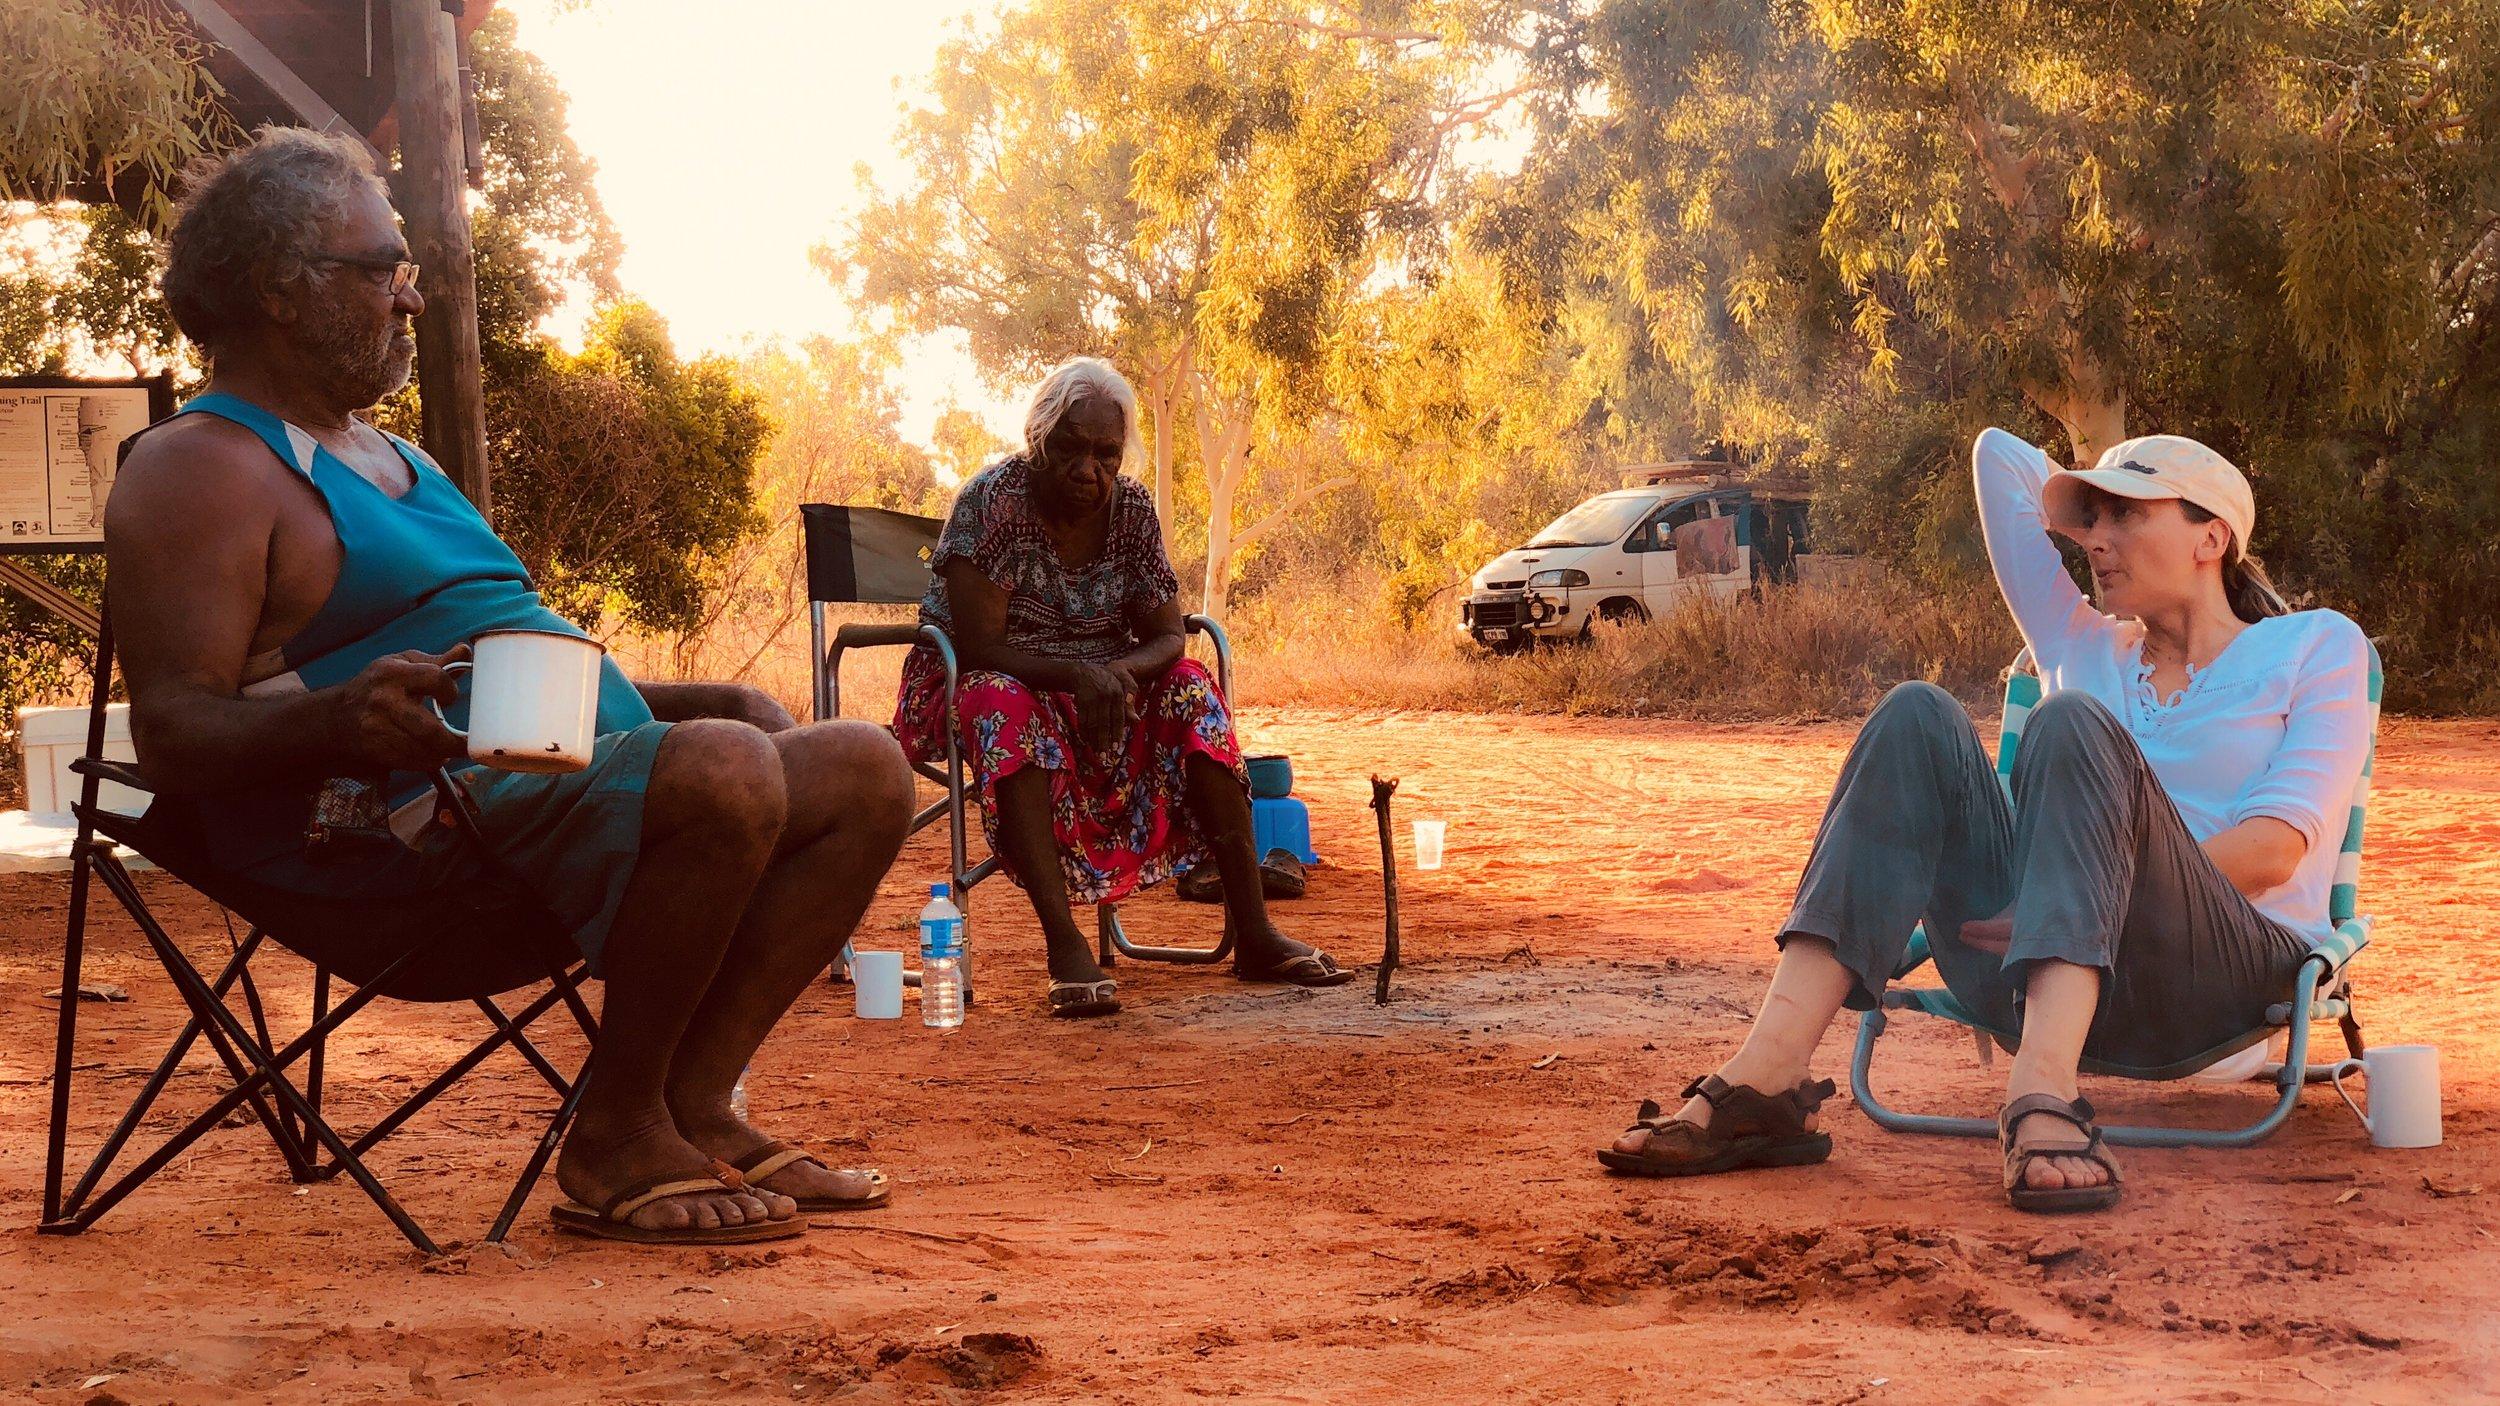 Photo: Alexander Hayes - (L) Phillip Roe, (C) Jeannie Wabi, (R) Magali McDuffie - Walmadan camp